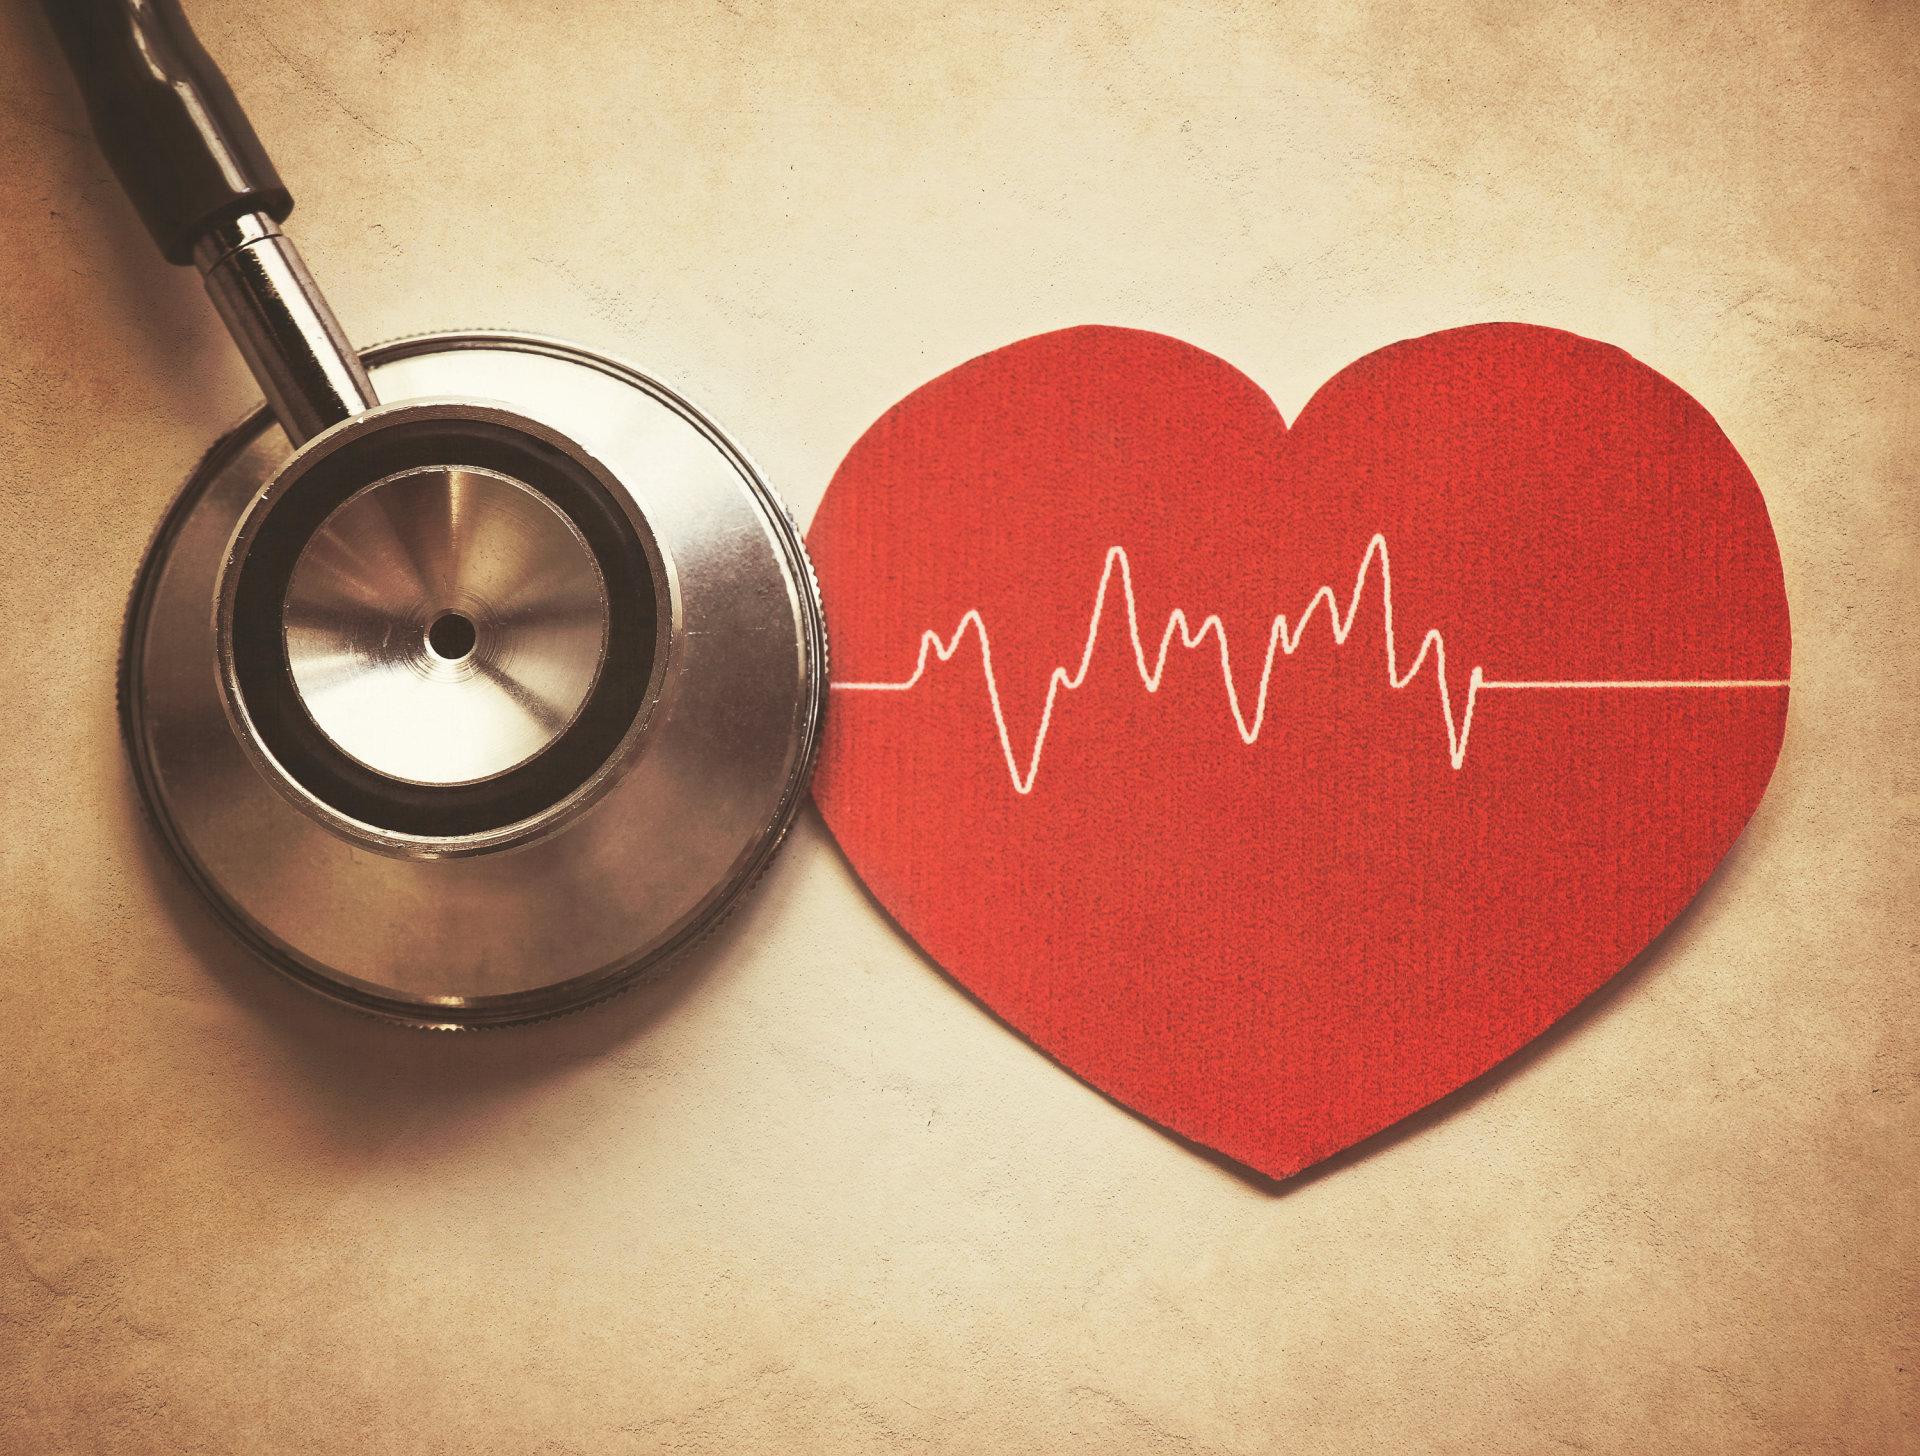 širdies sveikatos svoris troksevazino kapsulės ir hipertenzija